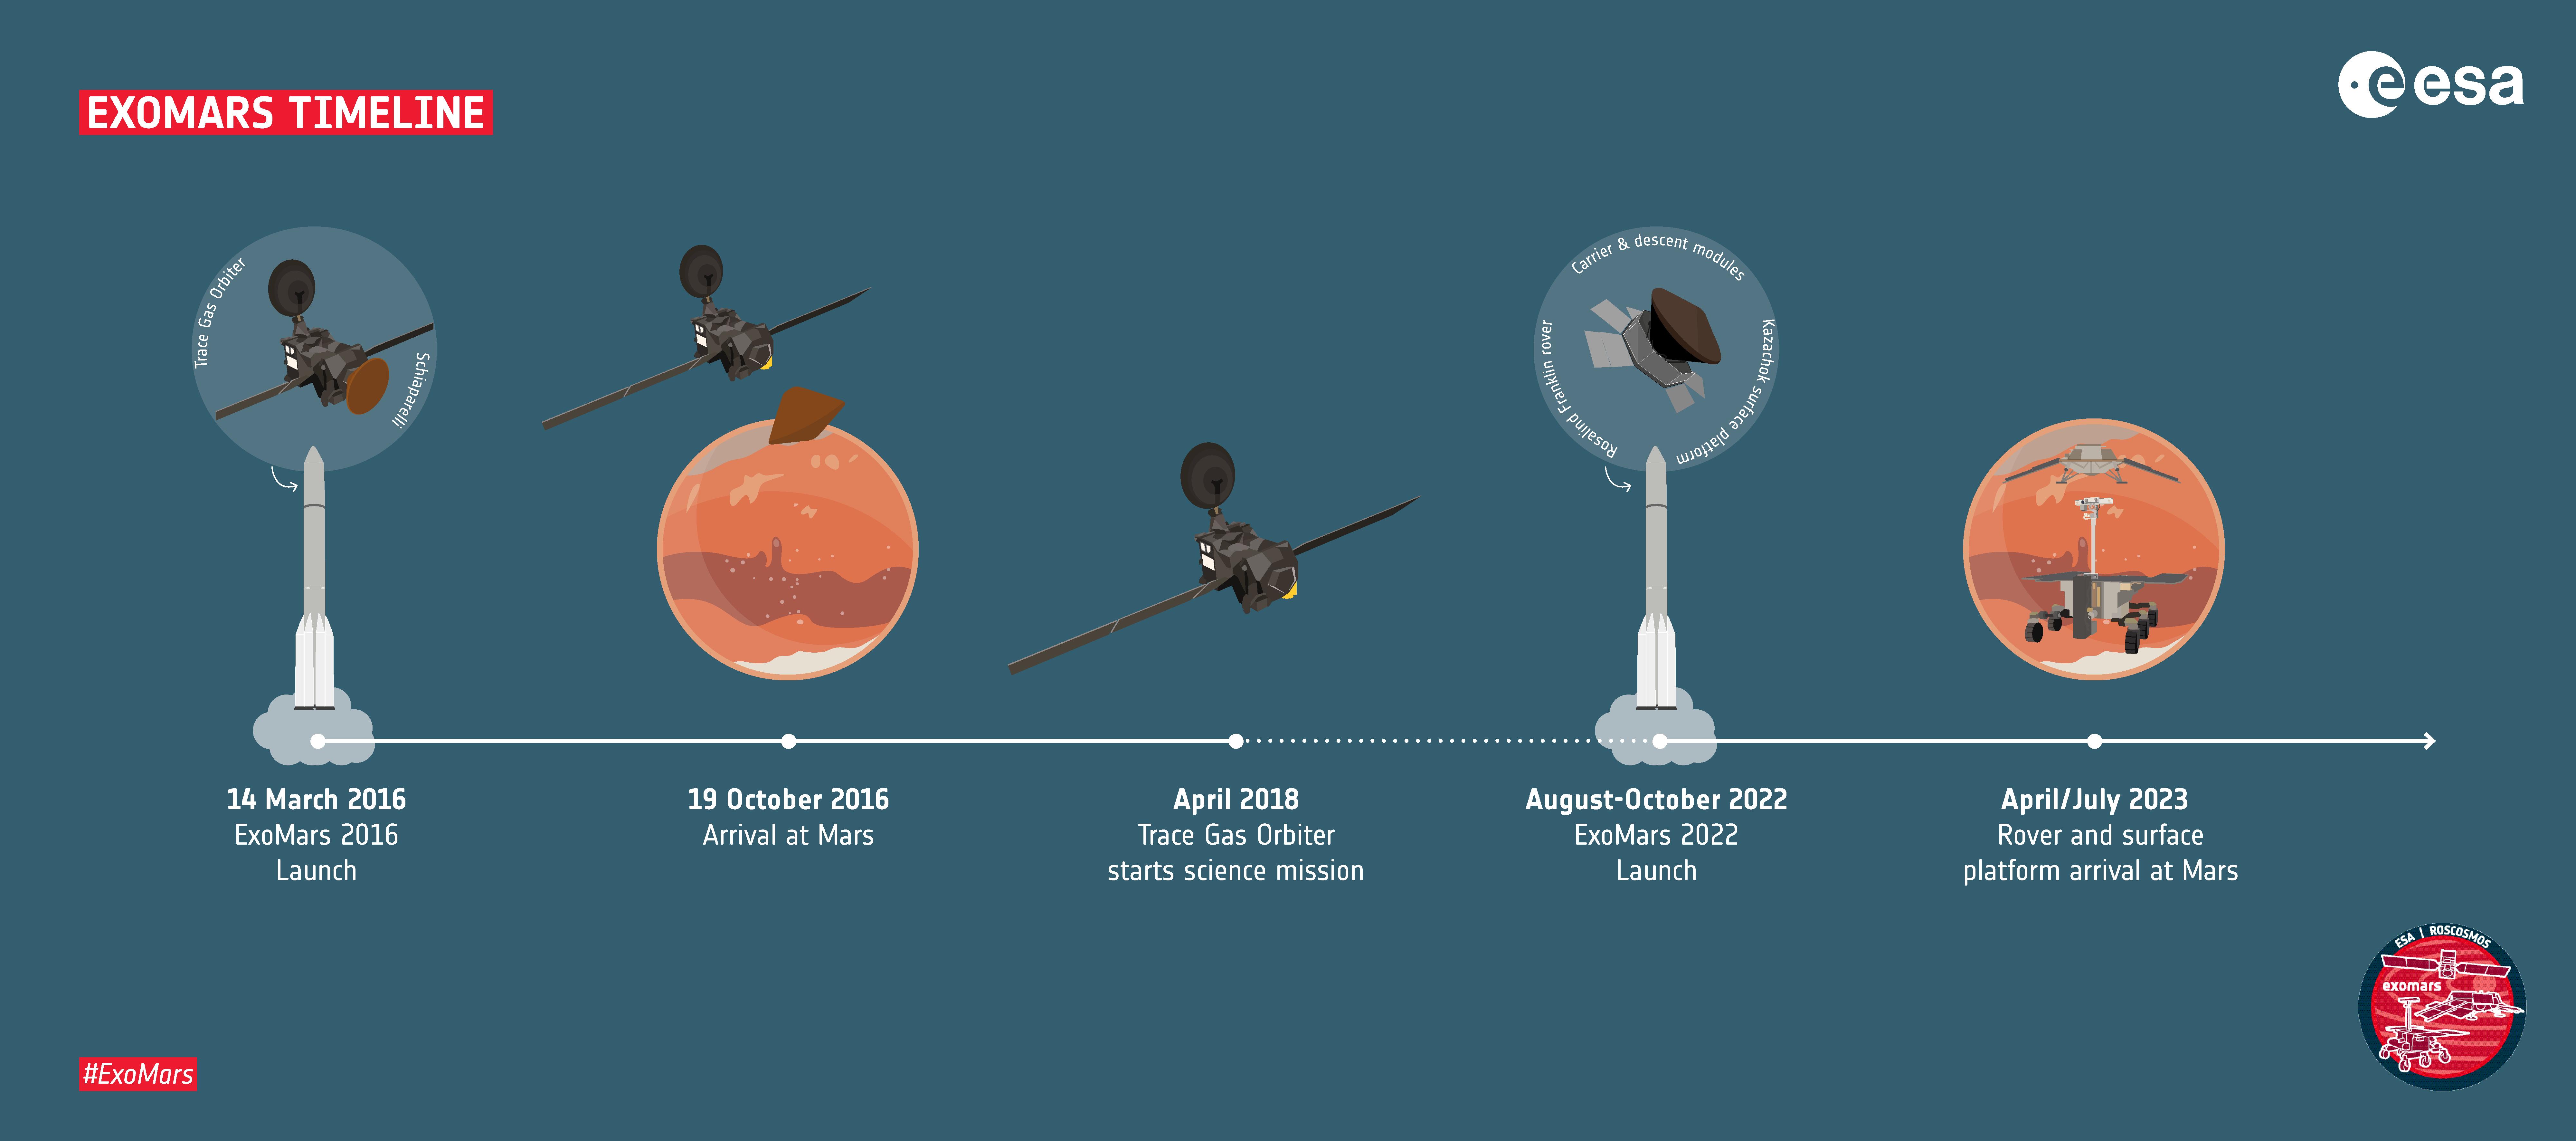 The revised Exomars timeline, including an earlier orbital mission.